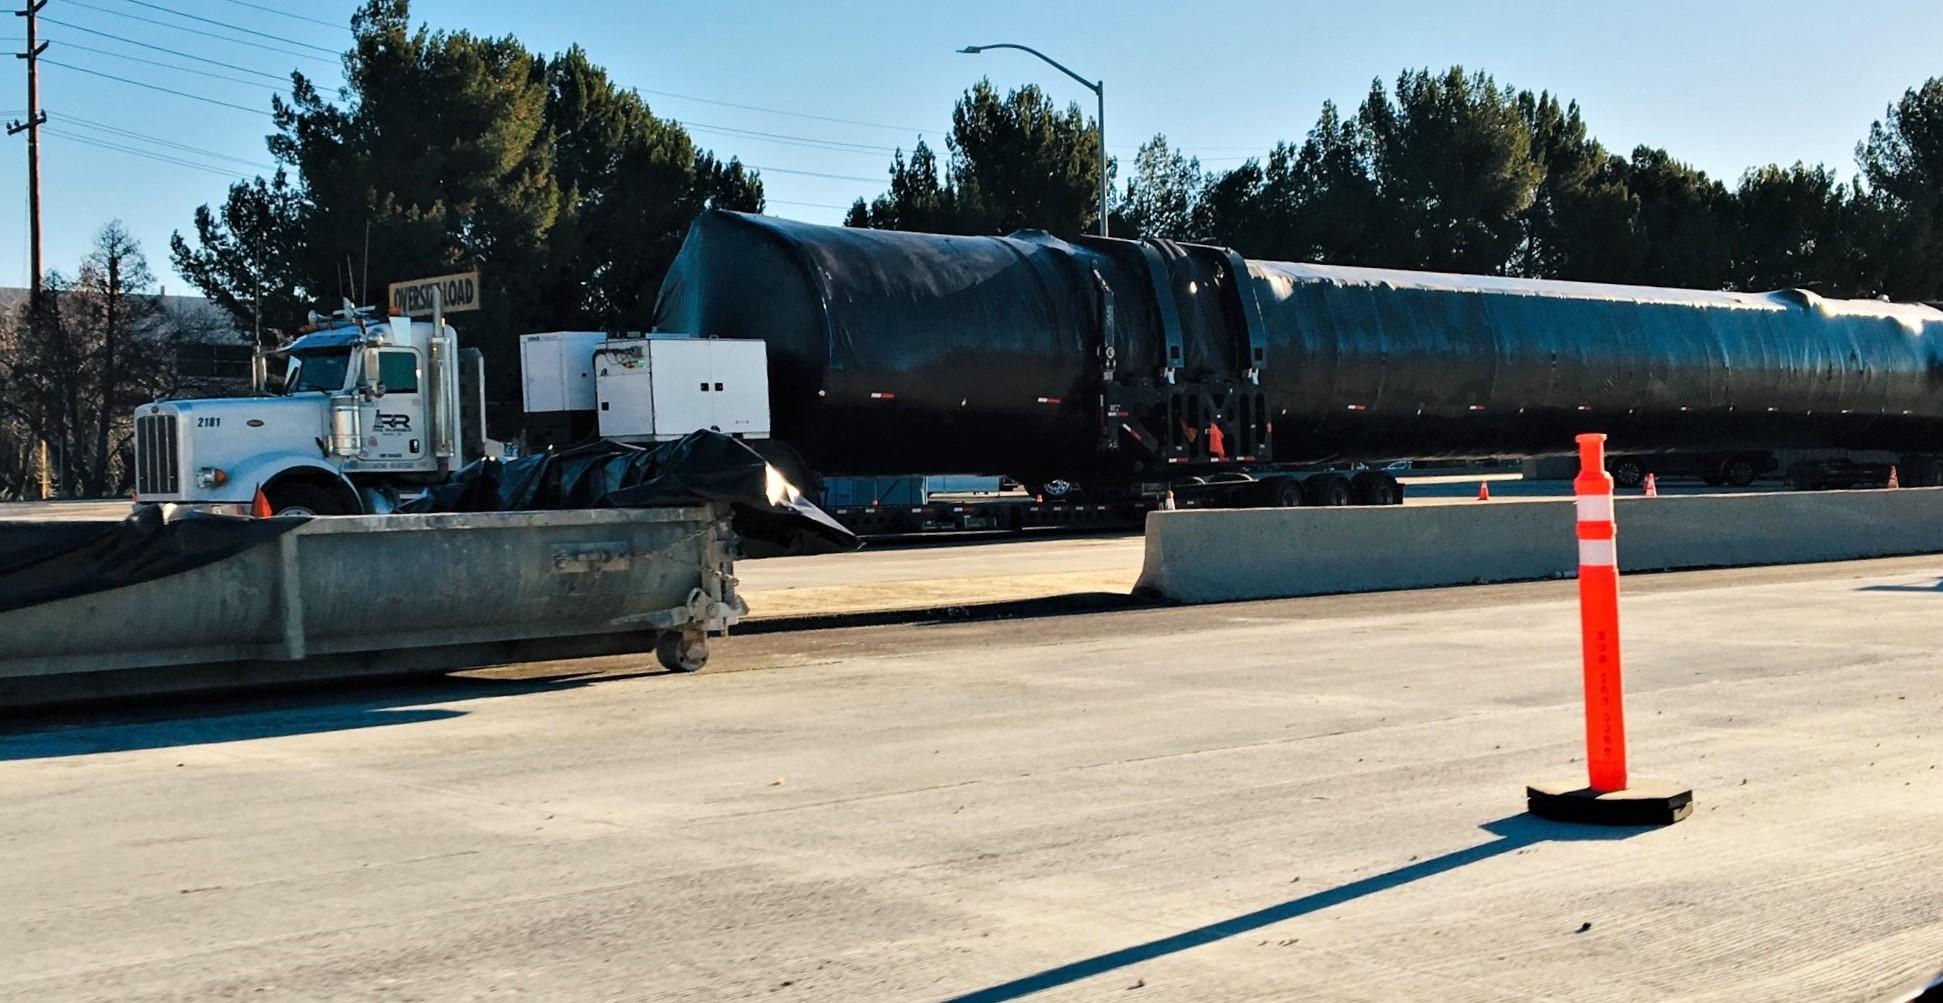 Falcon 9 booster I-5N Valencia CA 012219 (Reddit – intamin1) 2 crop 2